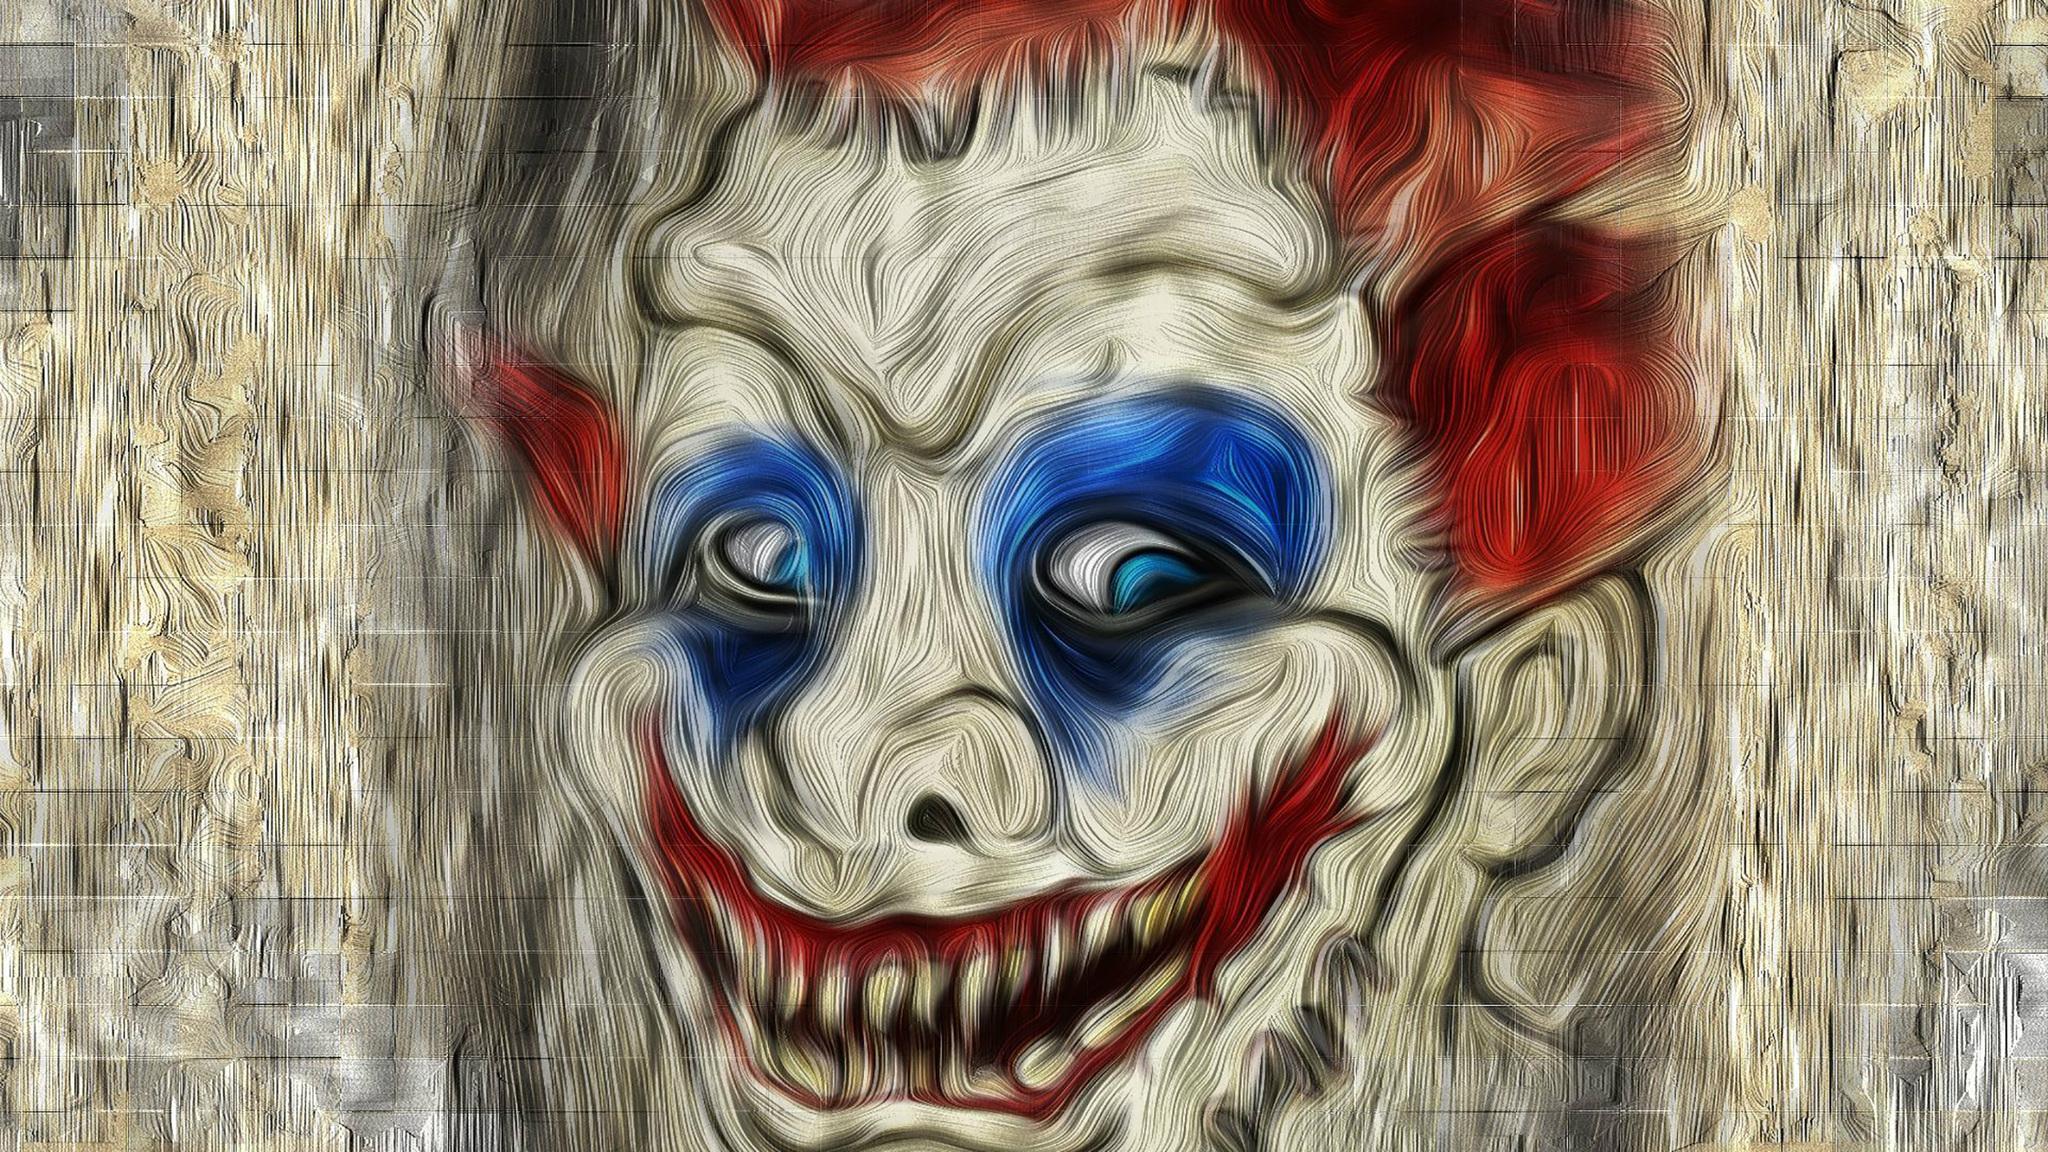 2048x1152 Clown 2048x1152 Resolution HD 4k Wallpapers ...